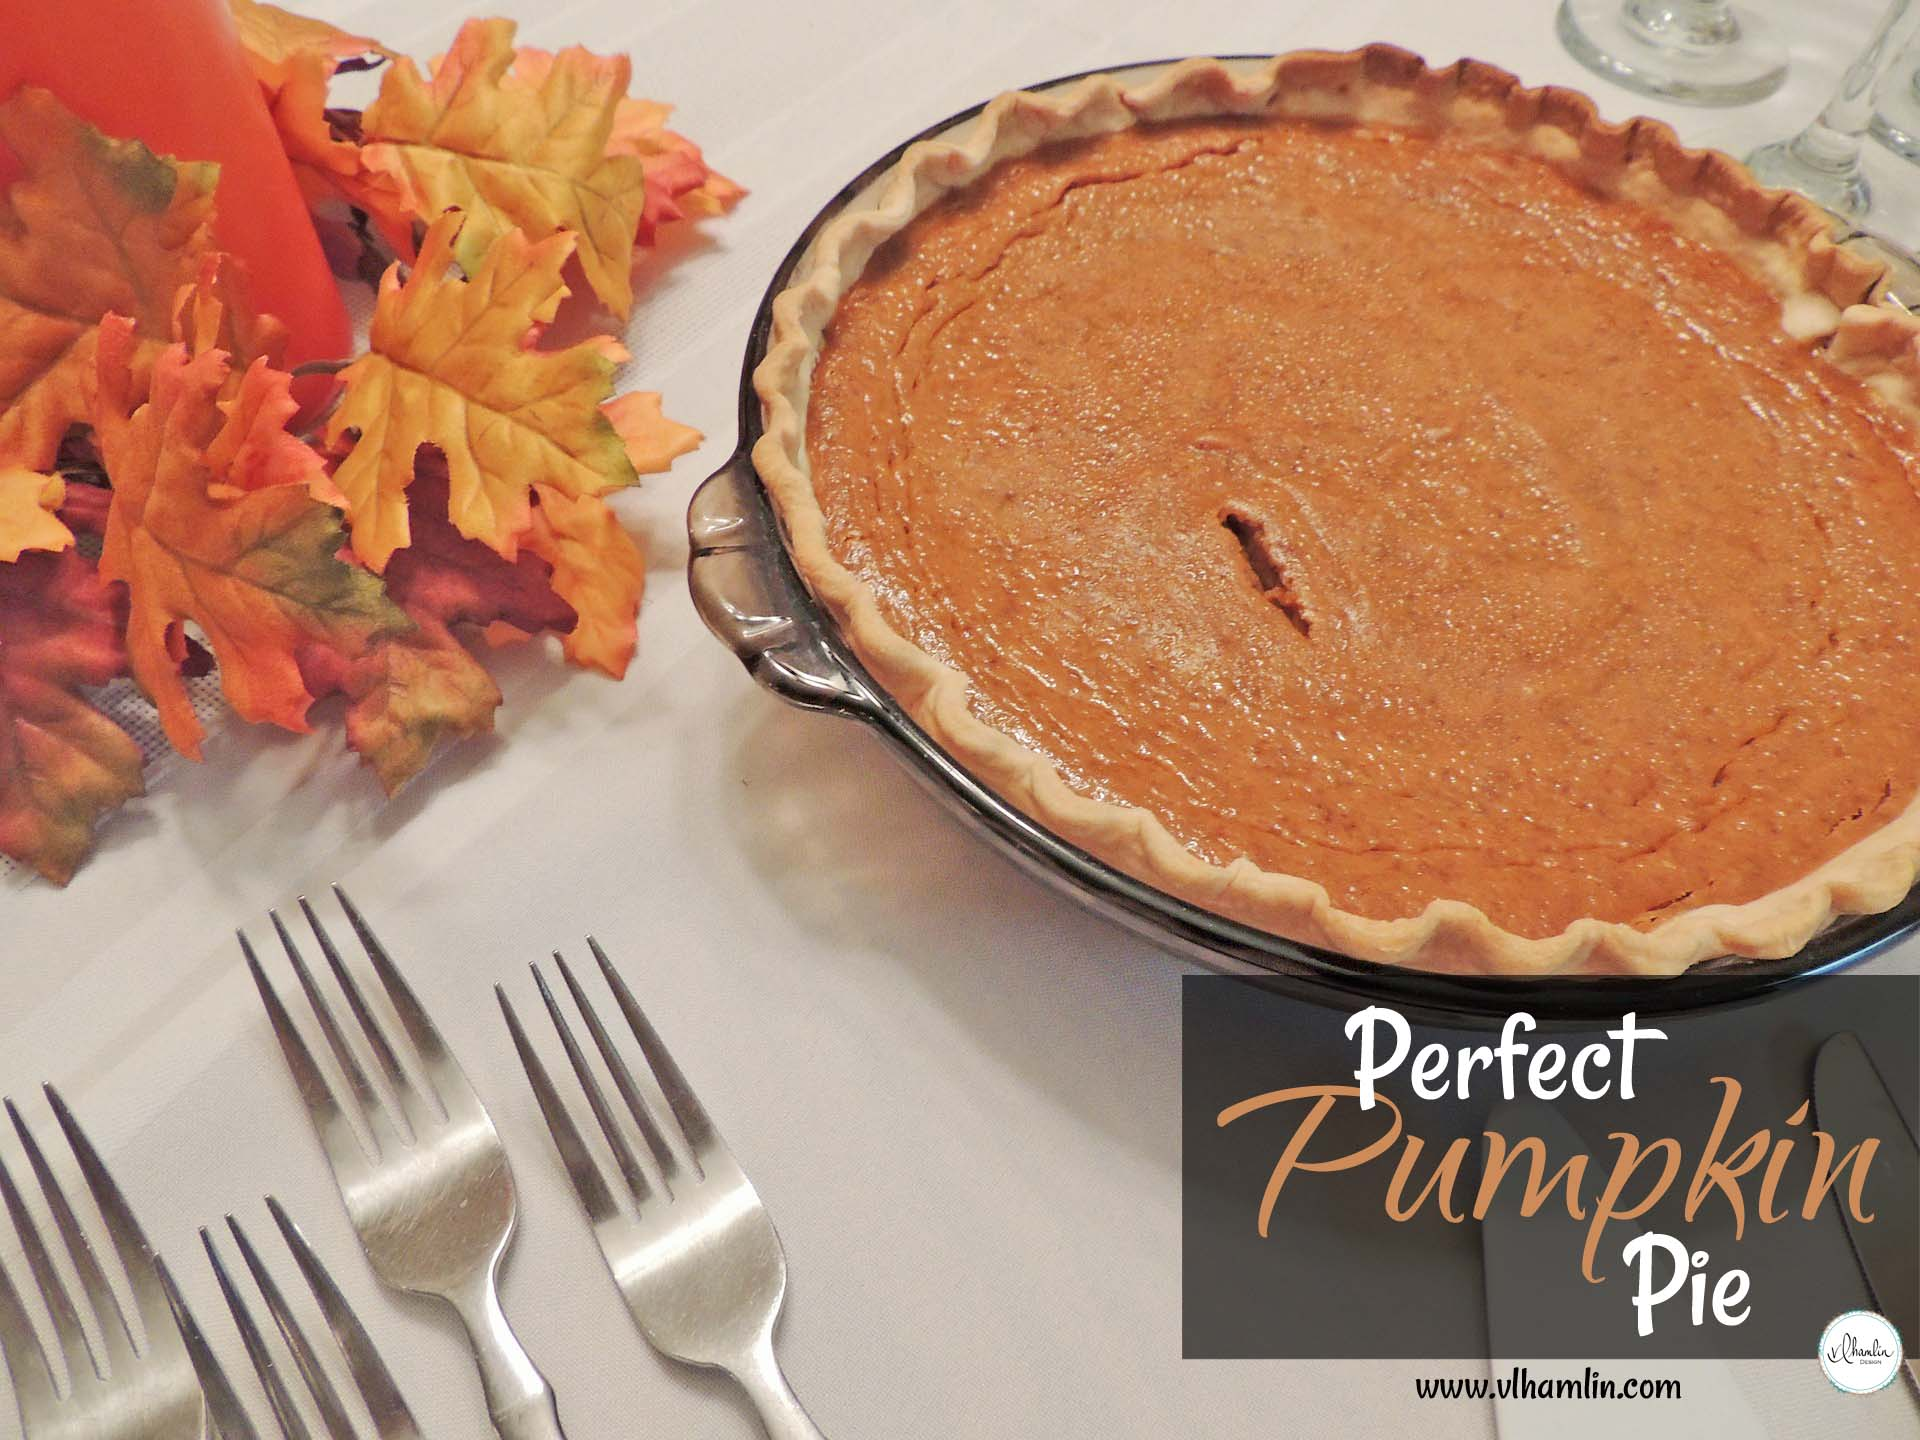 Perfect Pumpkin Pie 2